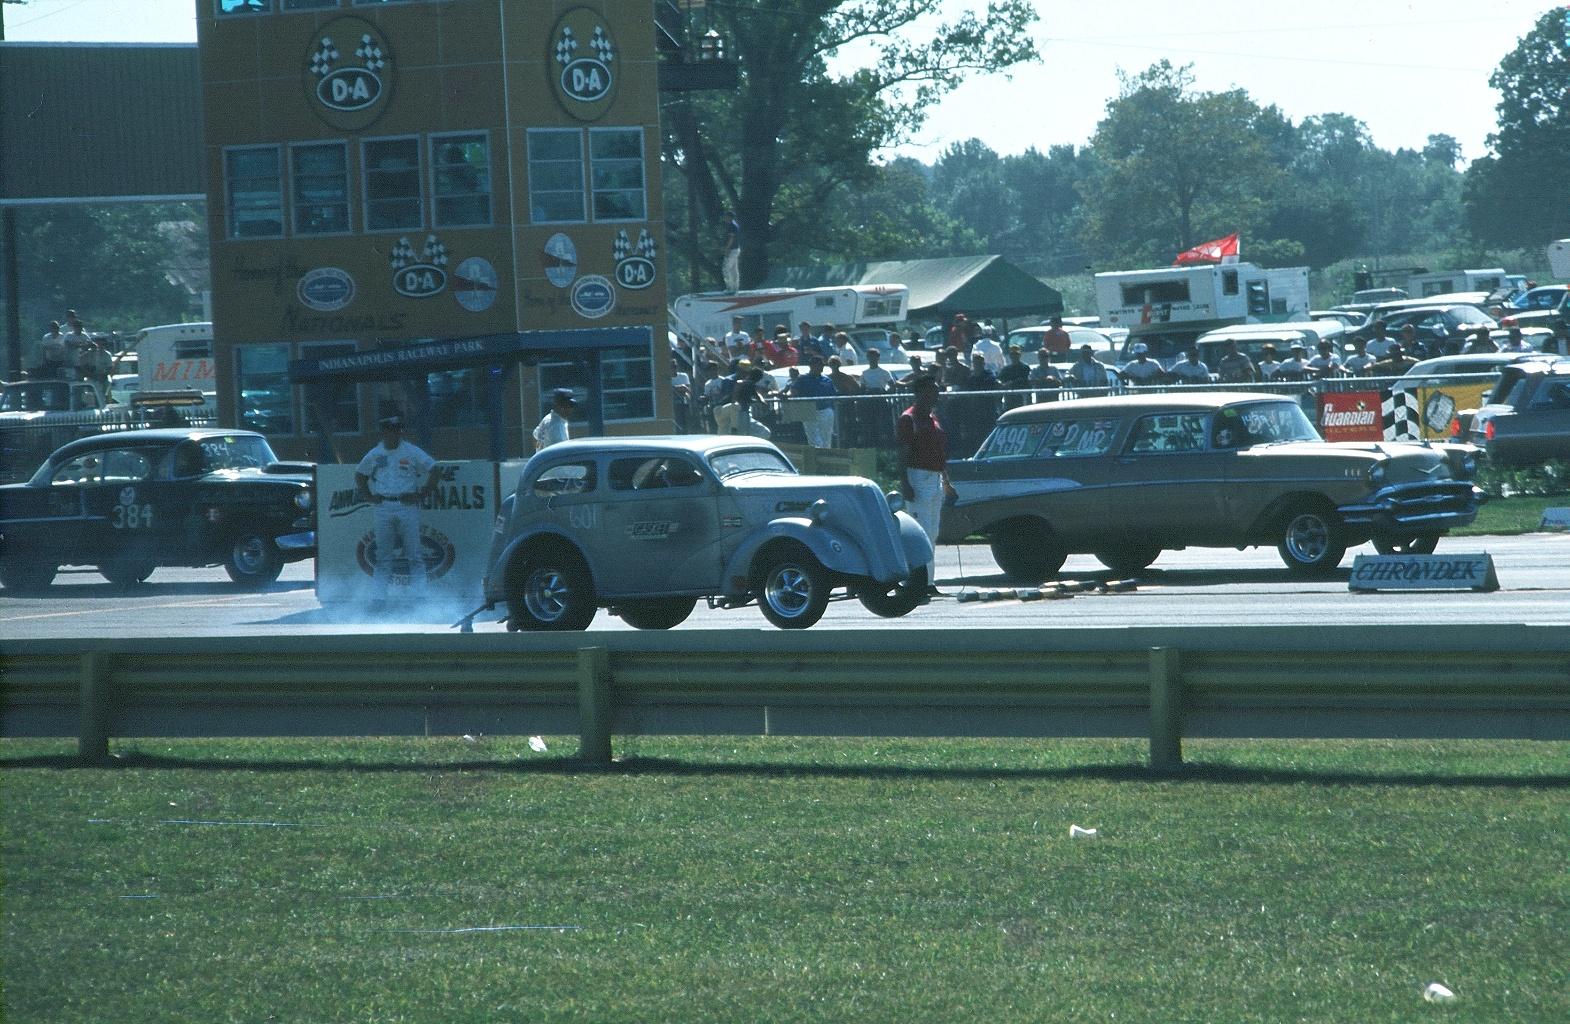 macs cars Picture 317.jpg